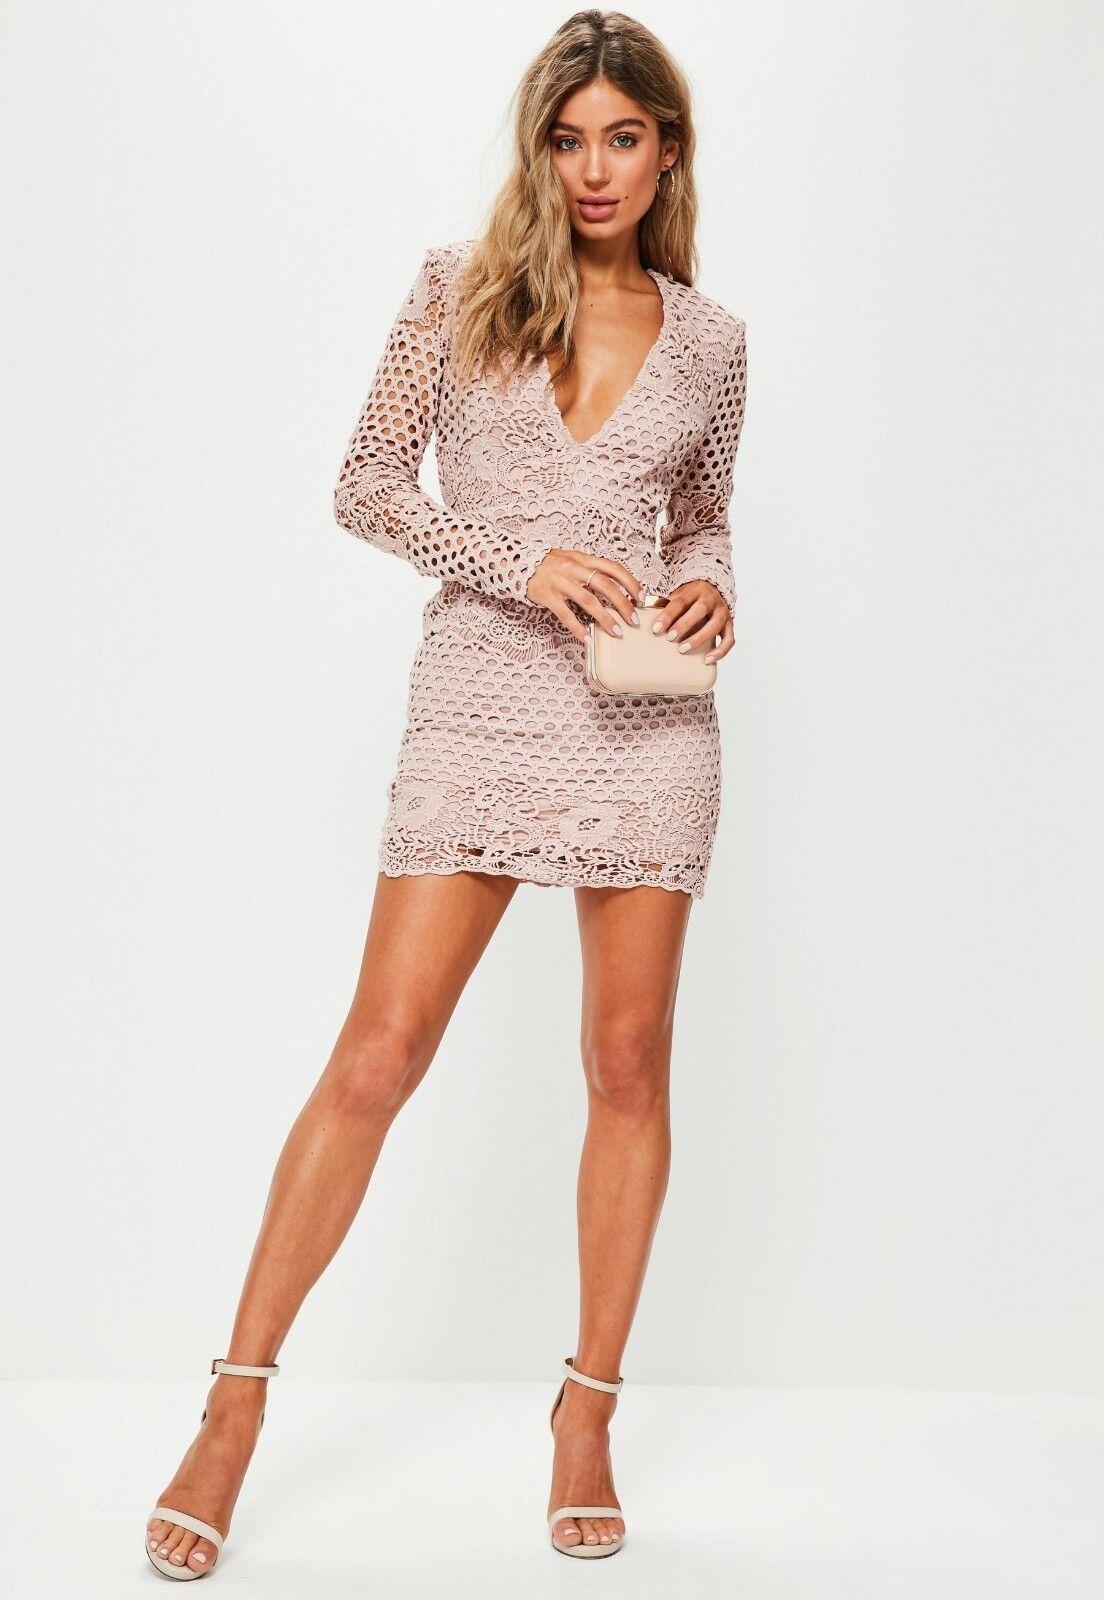 fba3efa4892 ... Missguided Plunge Lace Long Sleeve Bodycon Dress Dress Dress Size 8  BNWT RRP .99 Pink